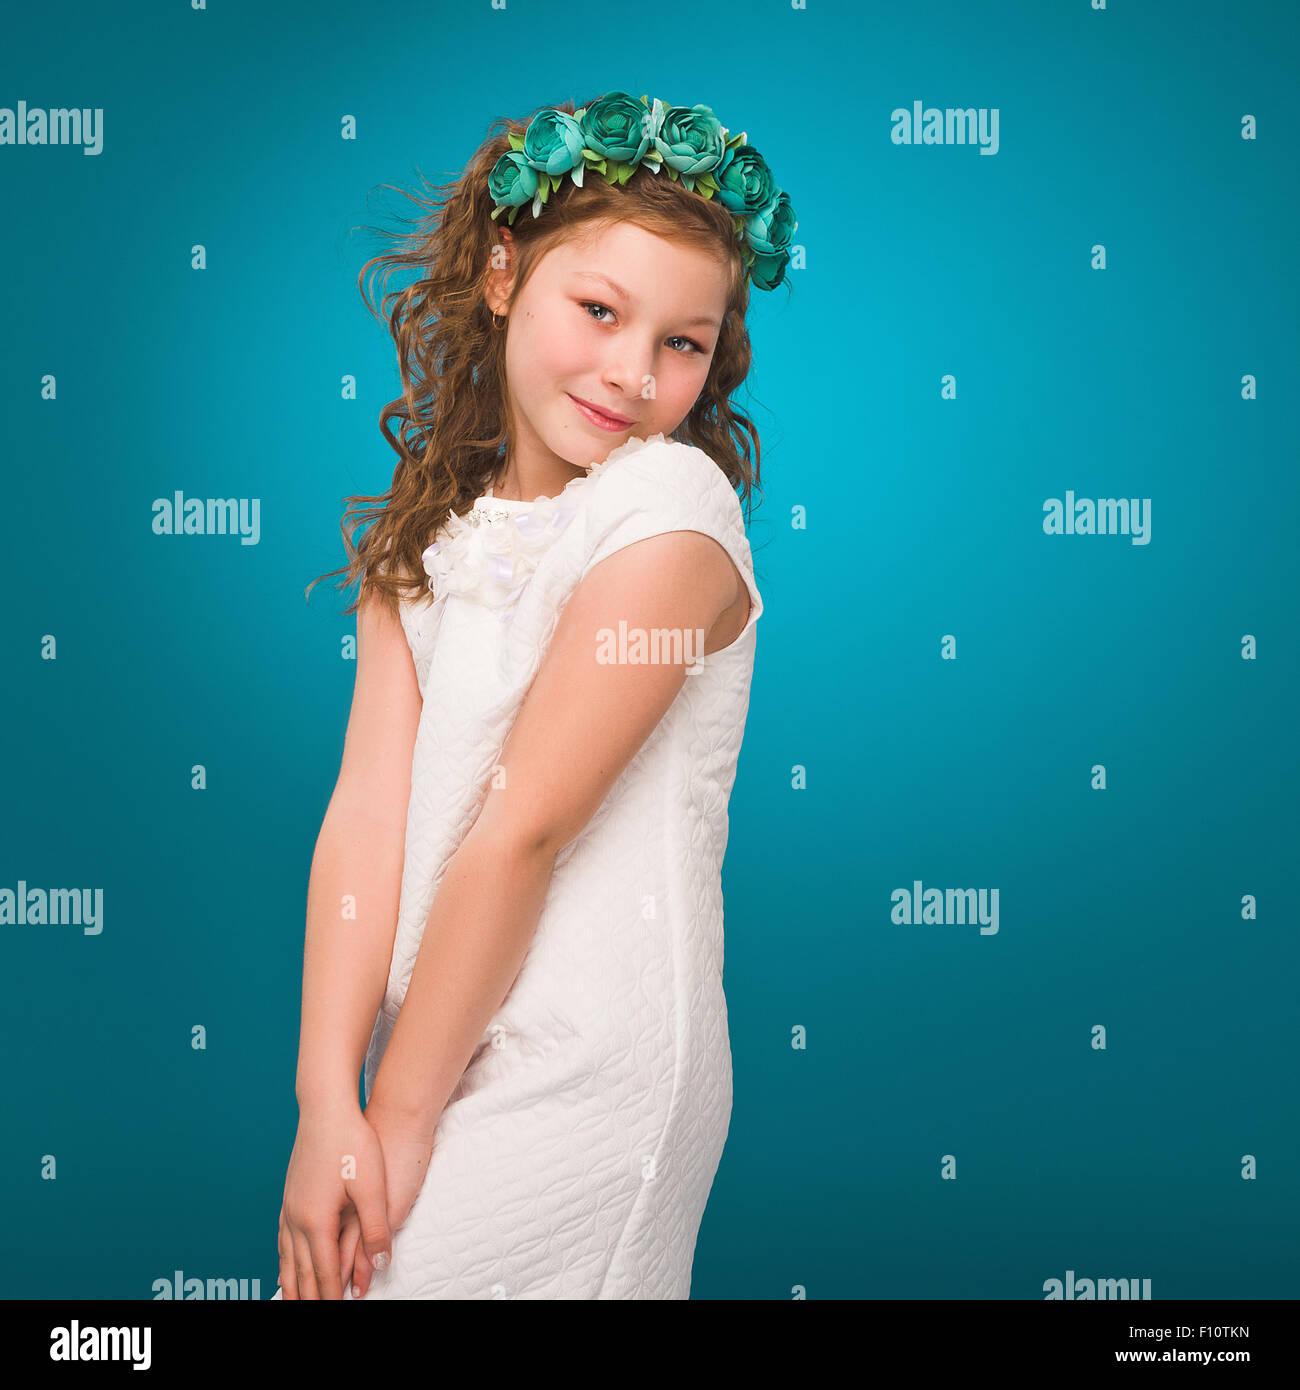 Cute teen girl nonude